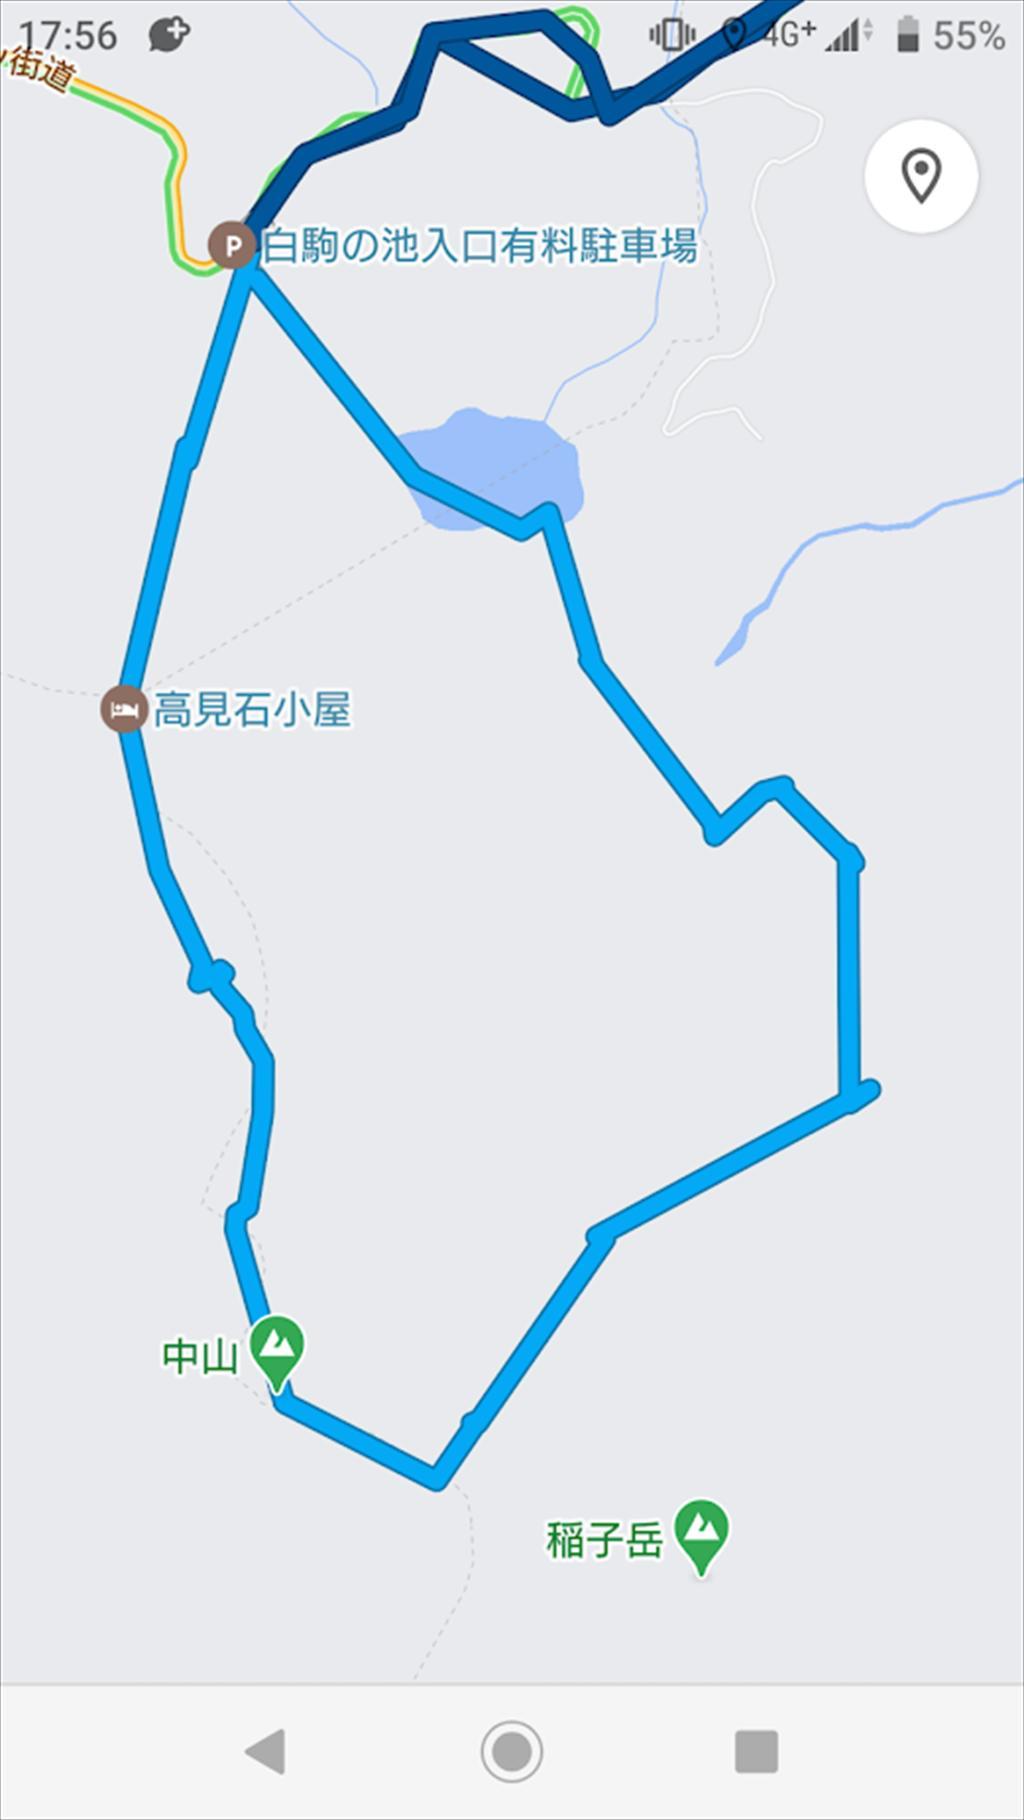 https://hayashida.jp/o/images2019-/Screenshot_20201014-175621_R.JPG